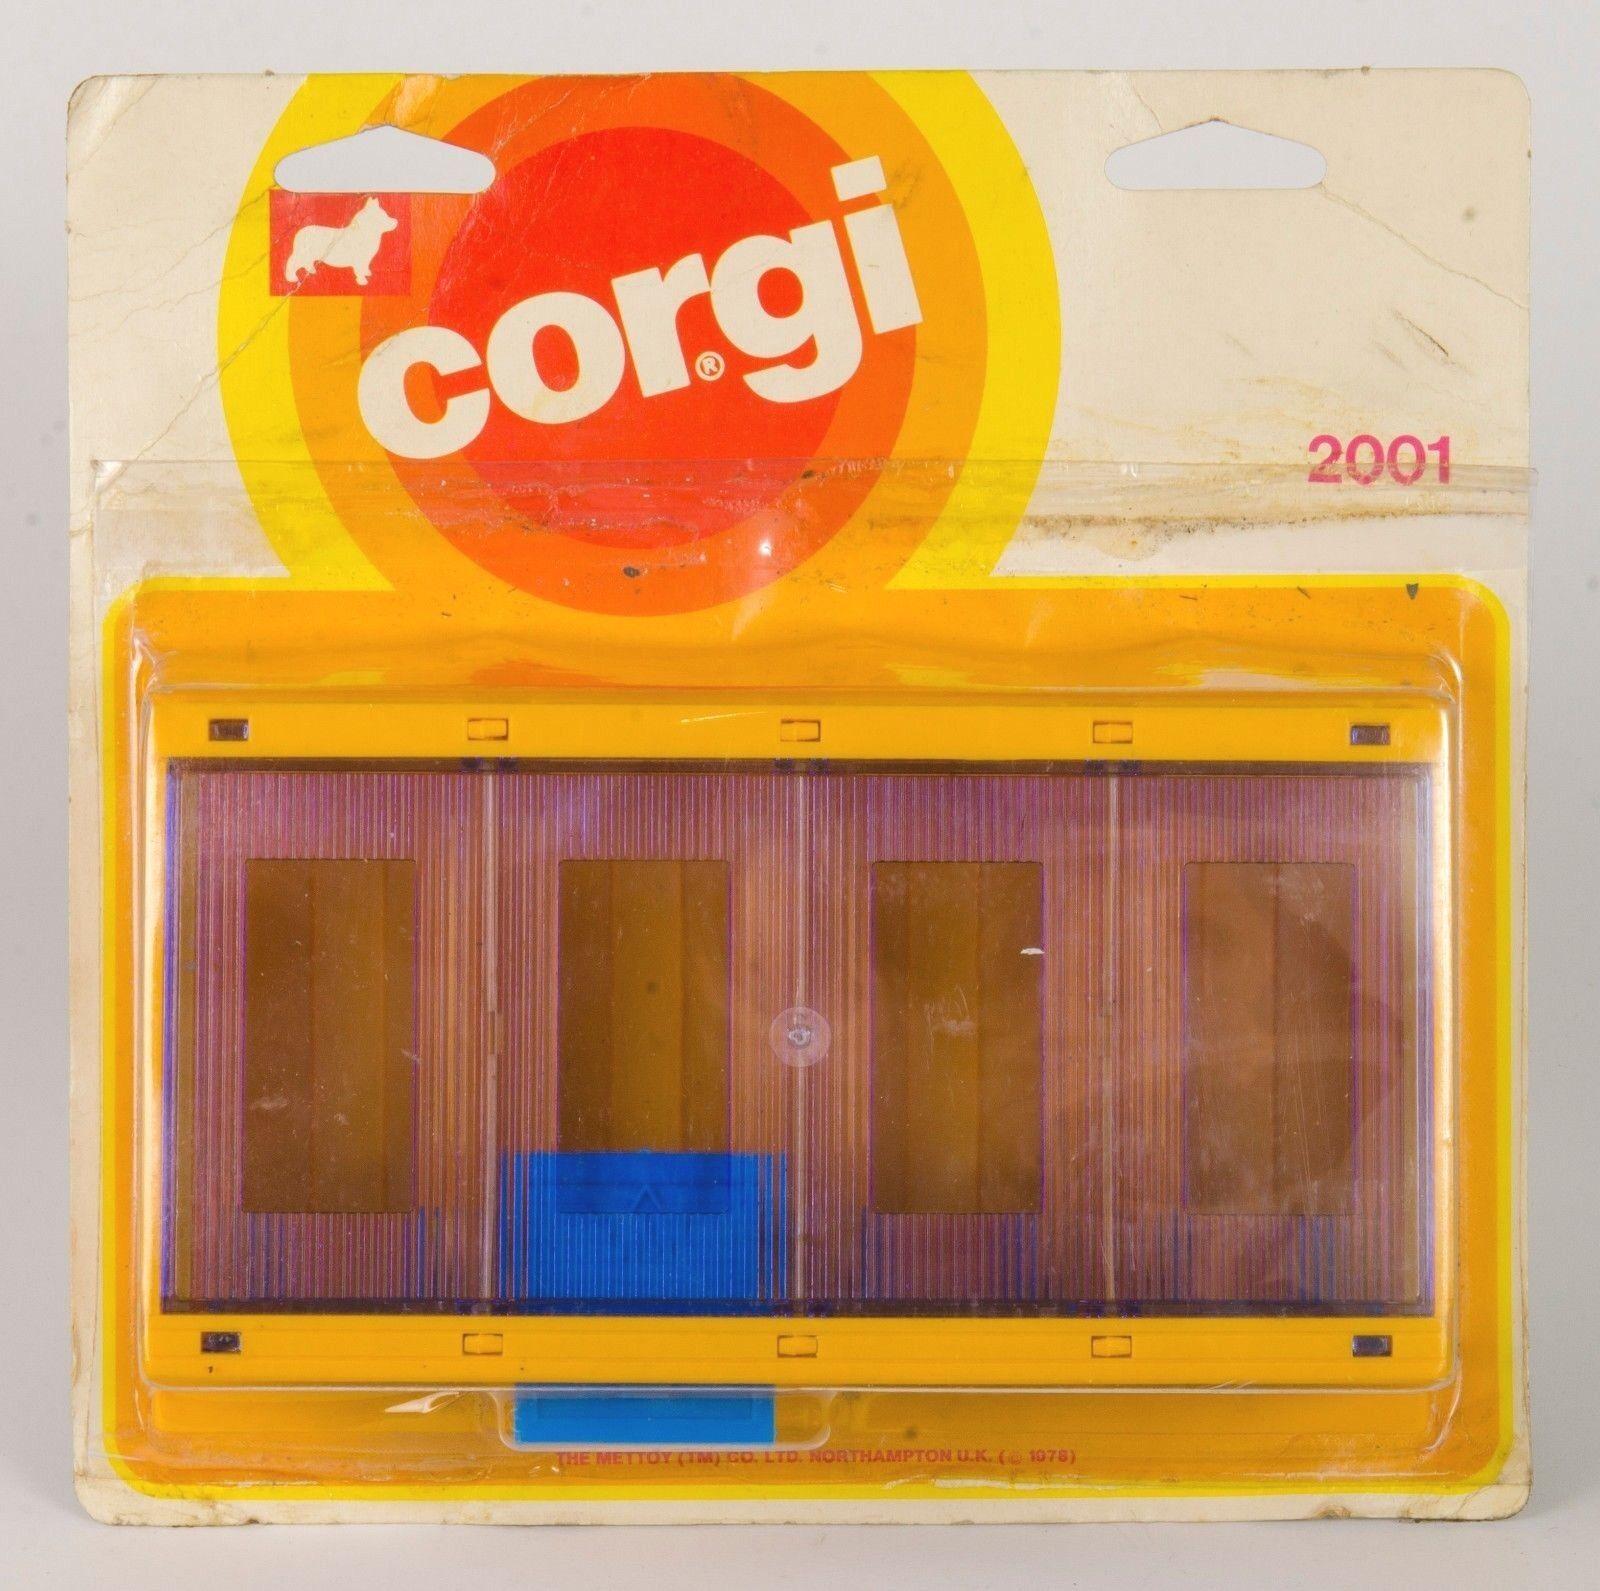 CORGI JUNIORS Nº 2001 Multi Garage. Nuovo di zecca in massa. RARE. ORIGINALE 1978